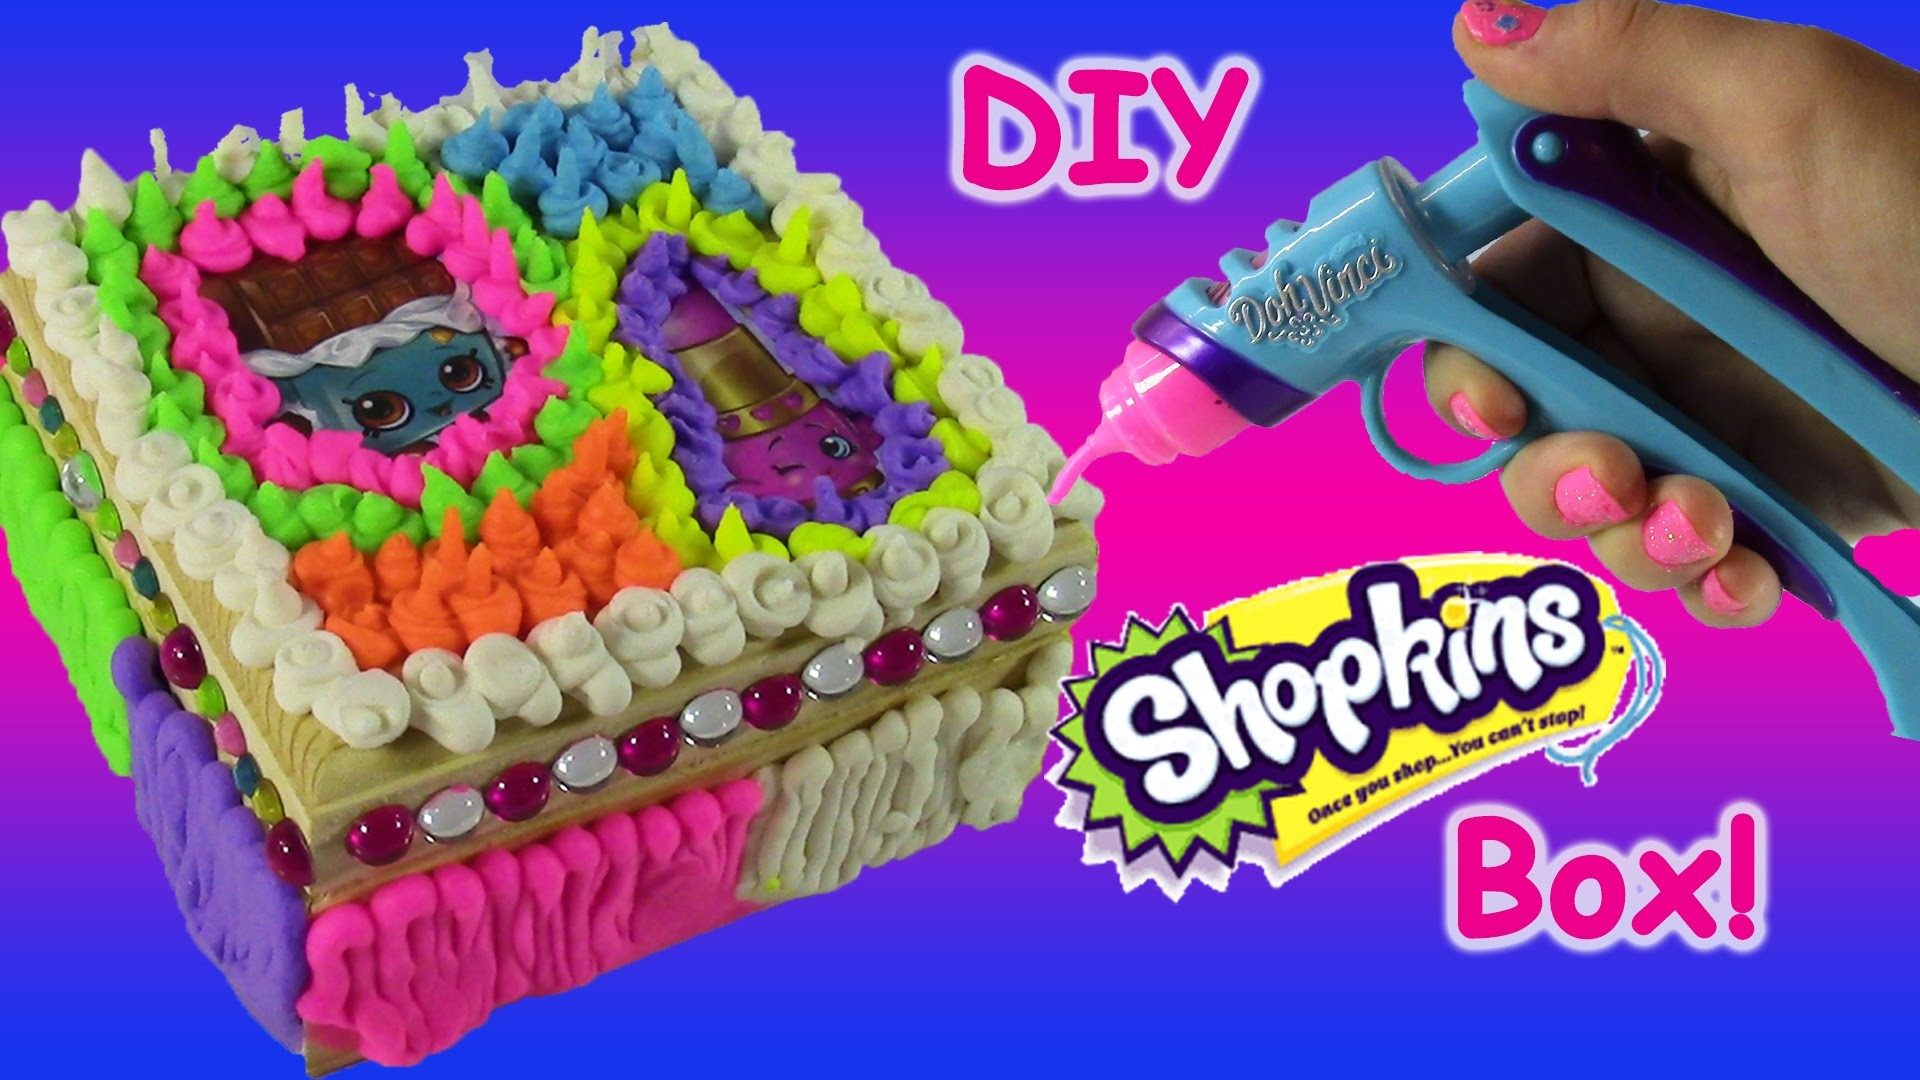 Make Your Own Shopkins Box with DohVinci! DIY SHopkins Keepsake! Lippy Lips FUN Surprises